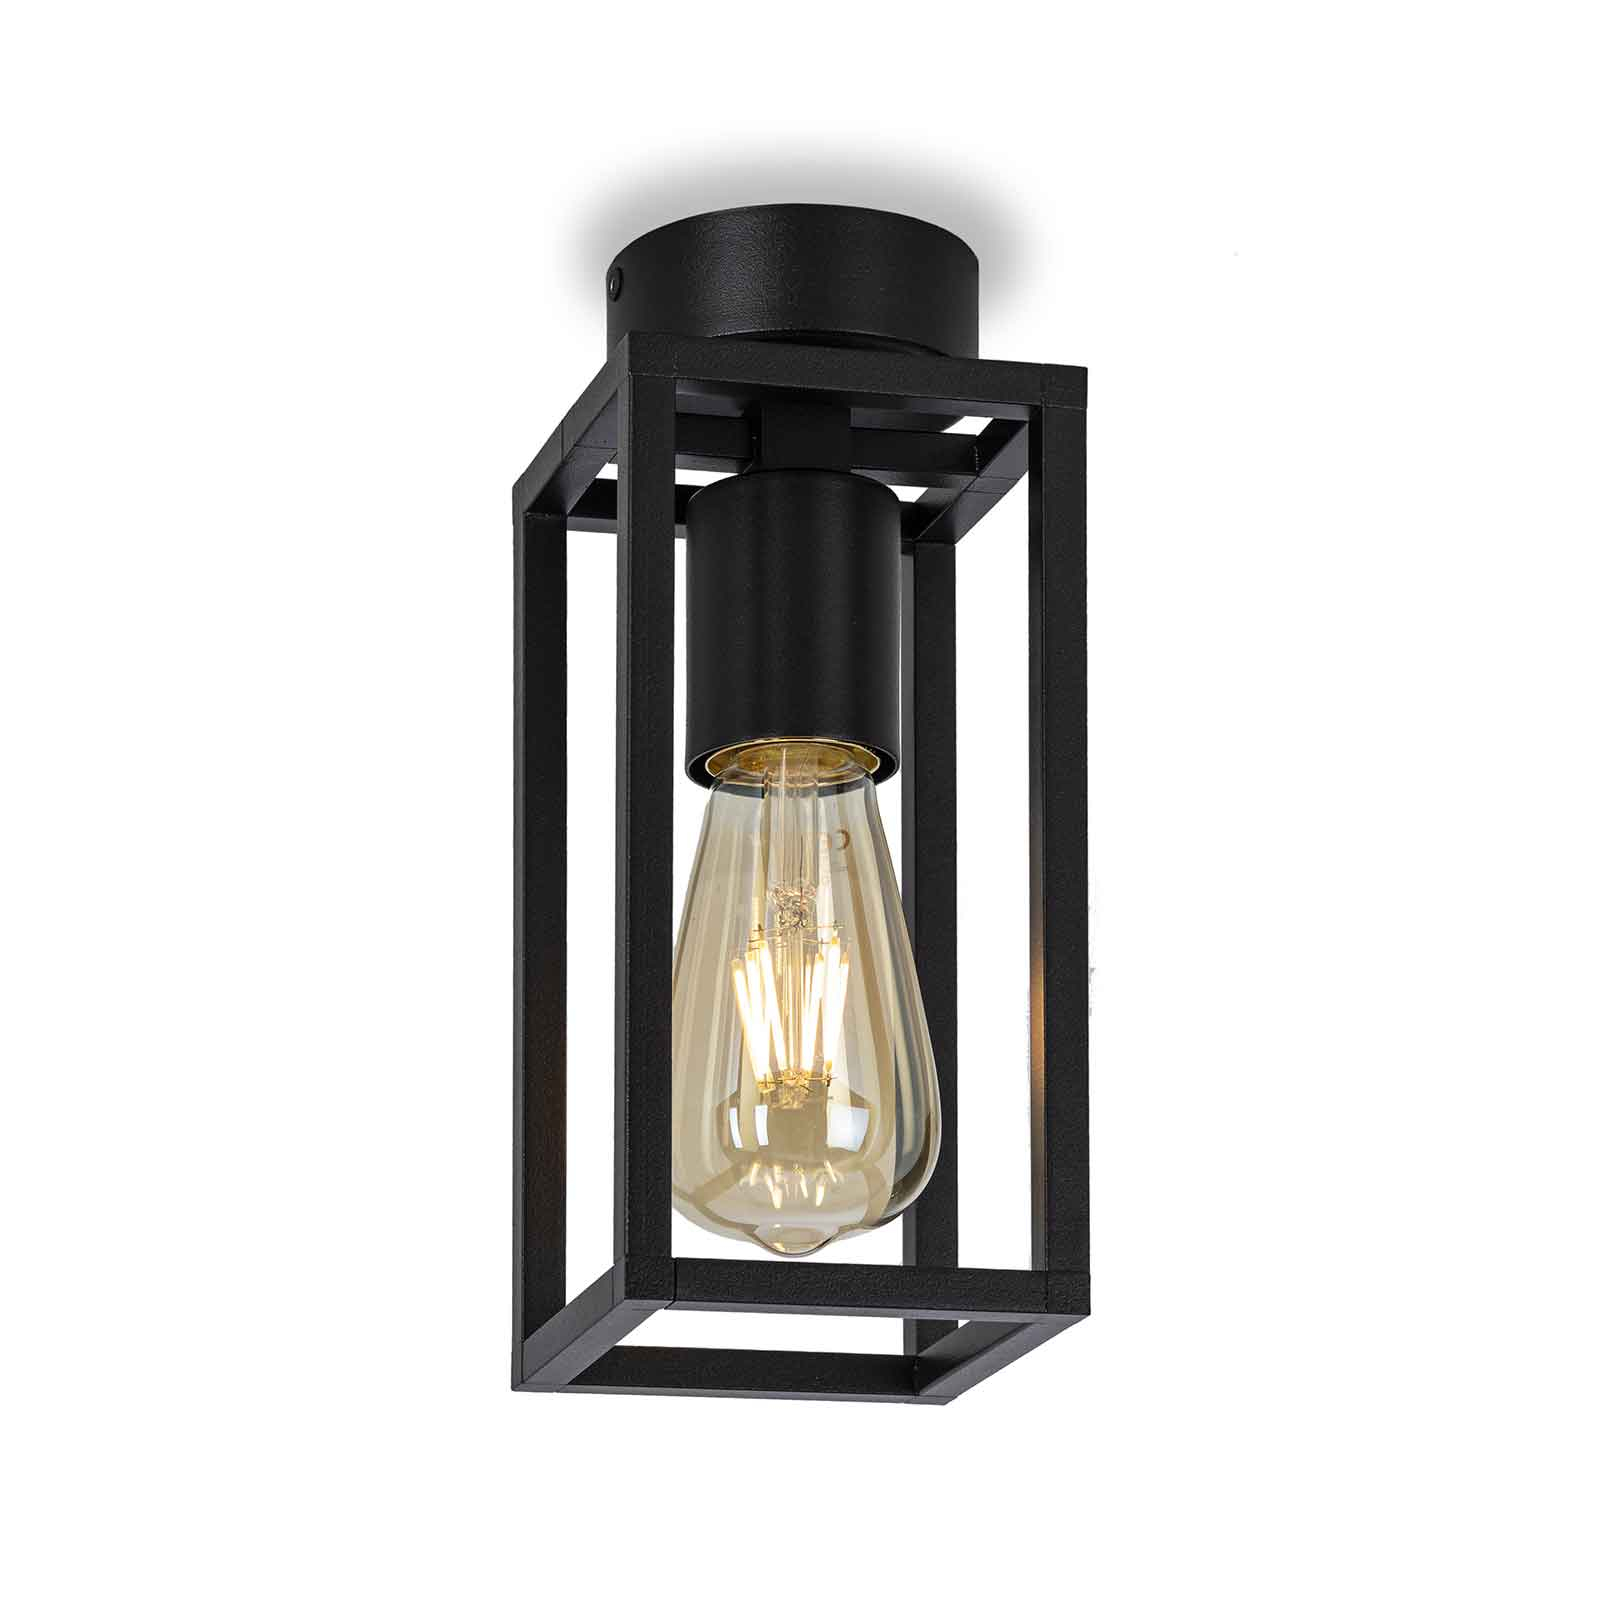 Lampa sufitowa Cubic³ 3376 czarna